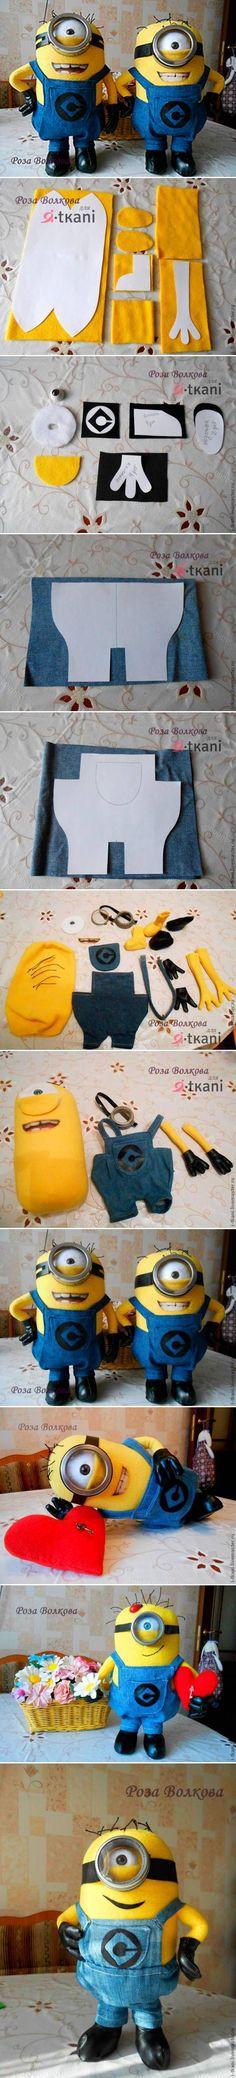 DIY Minion Dolls see written instructions at http://www.livemaster.ru/topic/428177-minen-iz-flisa